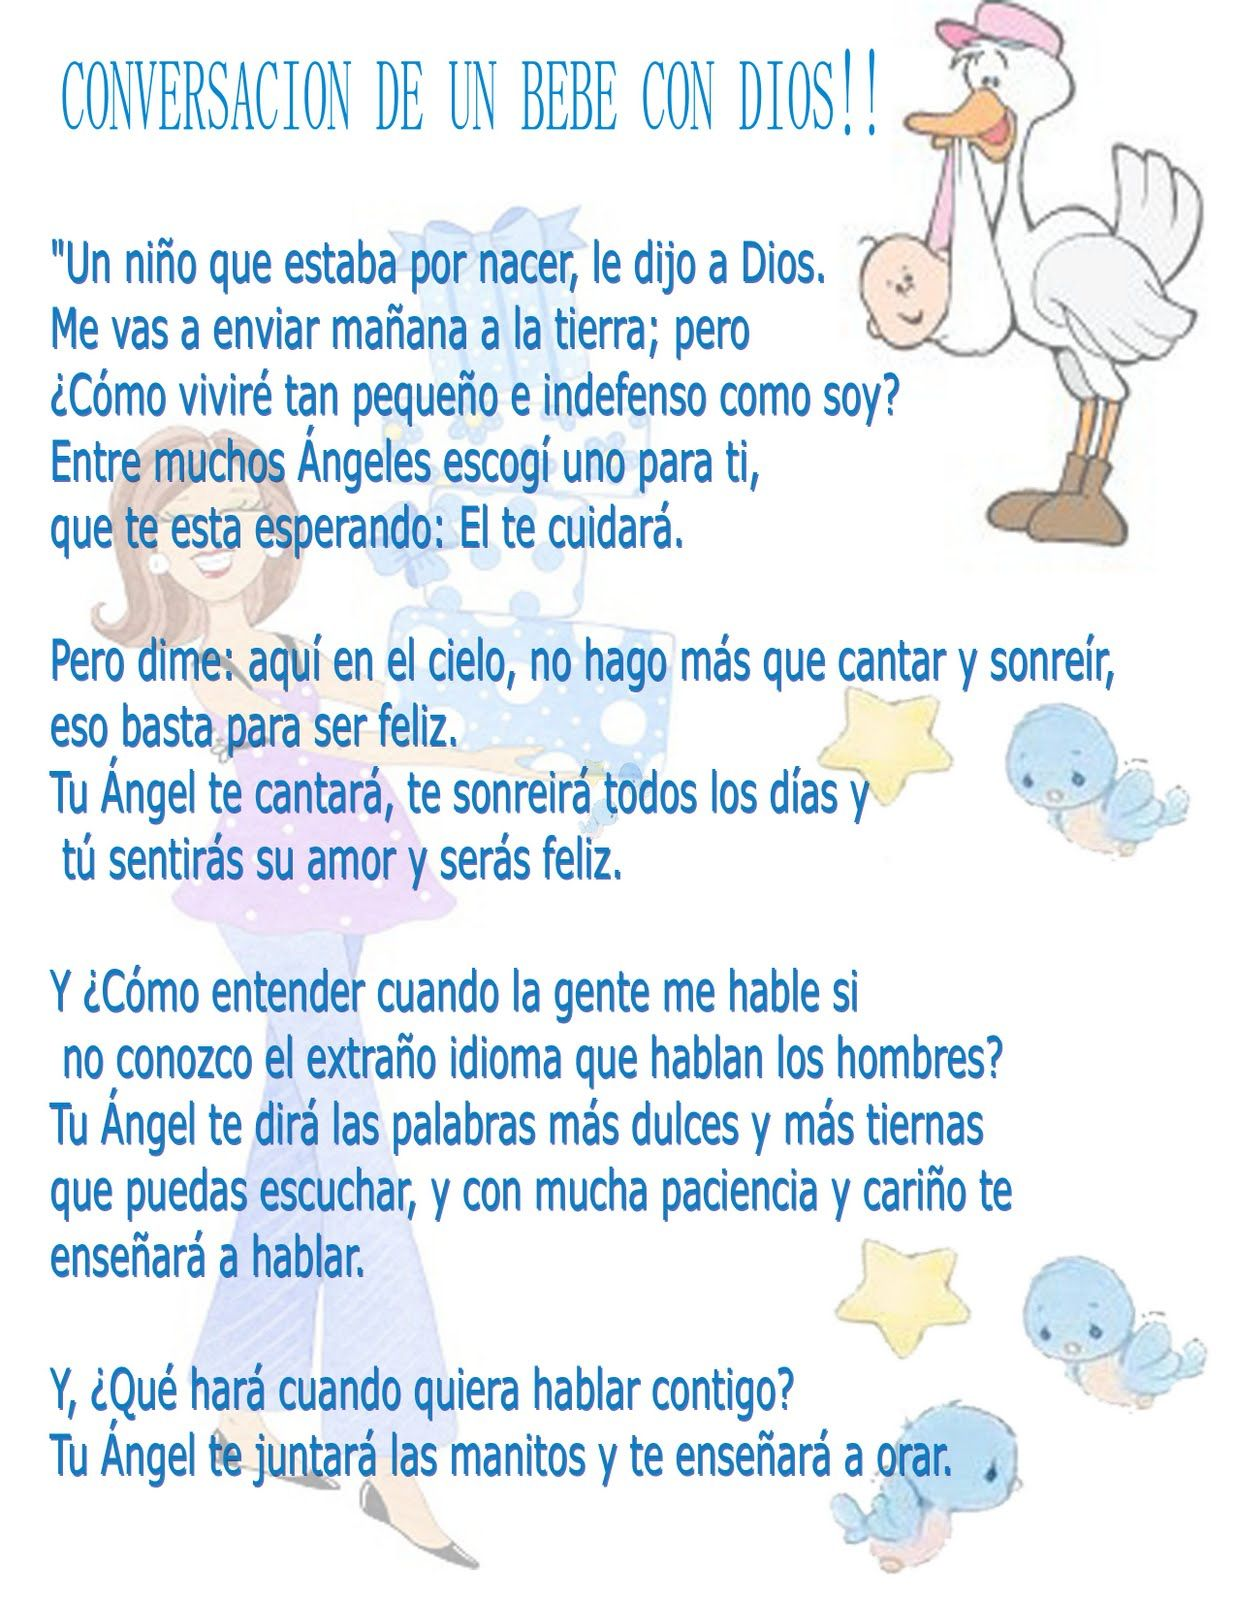 Frases Para Un Baby Shower De Nina : frases, shower, Poema, Shower, Tarjetas, Cumpleaños, Imprimirtarjetas, Mensajes, Shower,, Frases, Agradecimiento